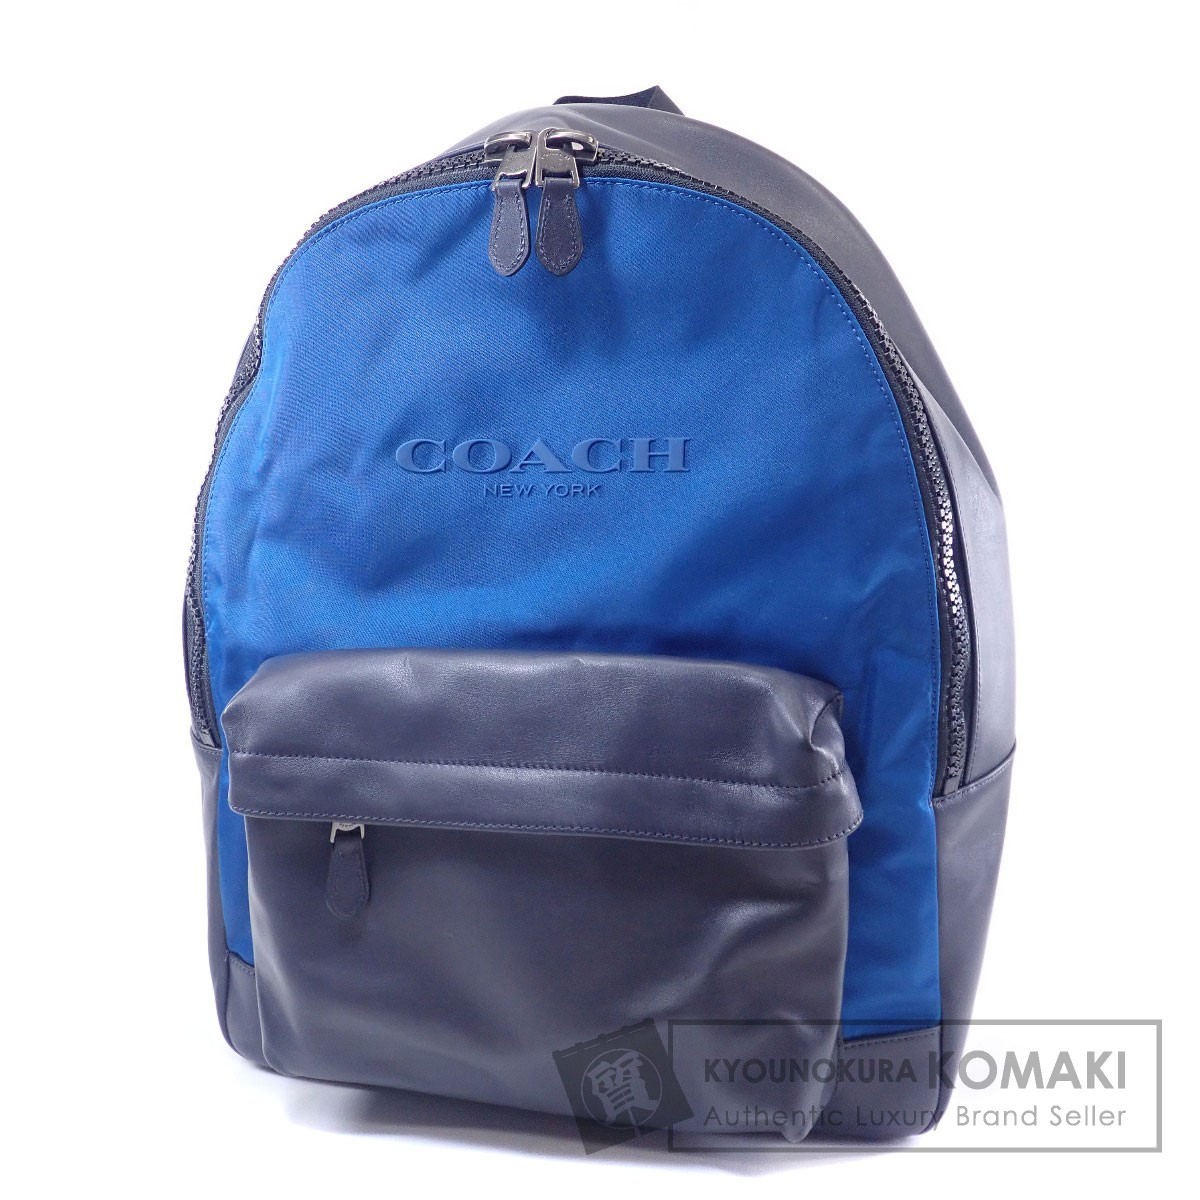 COACH F59321 リュック・デイパック ナイロン素材/レザー メンズ 【中古】【コーチ】